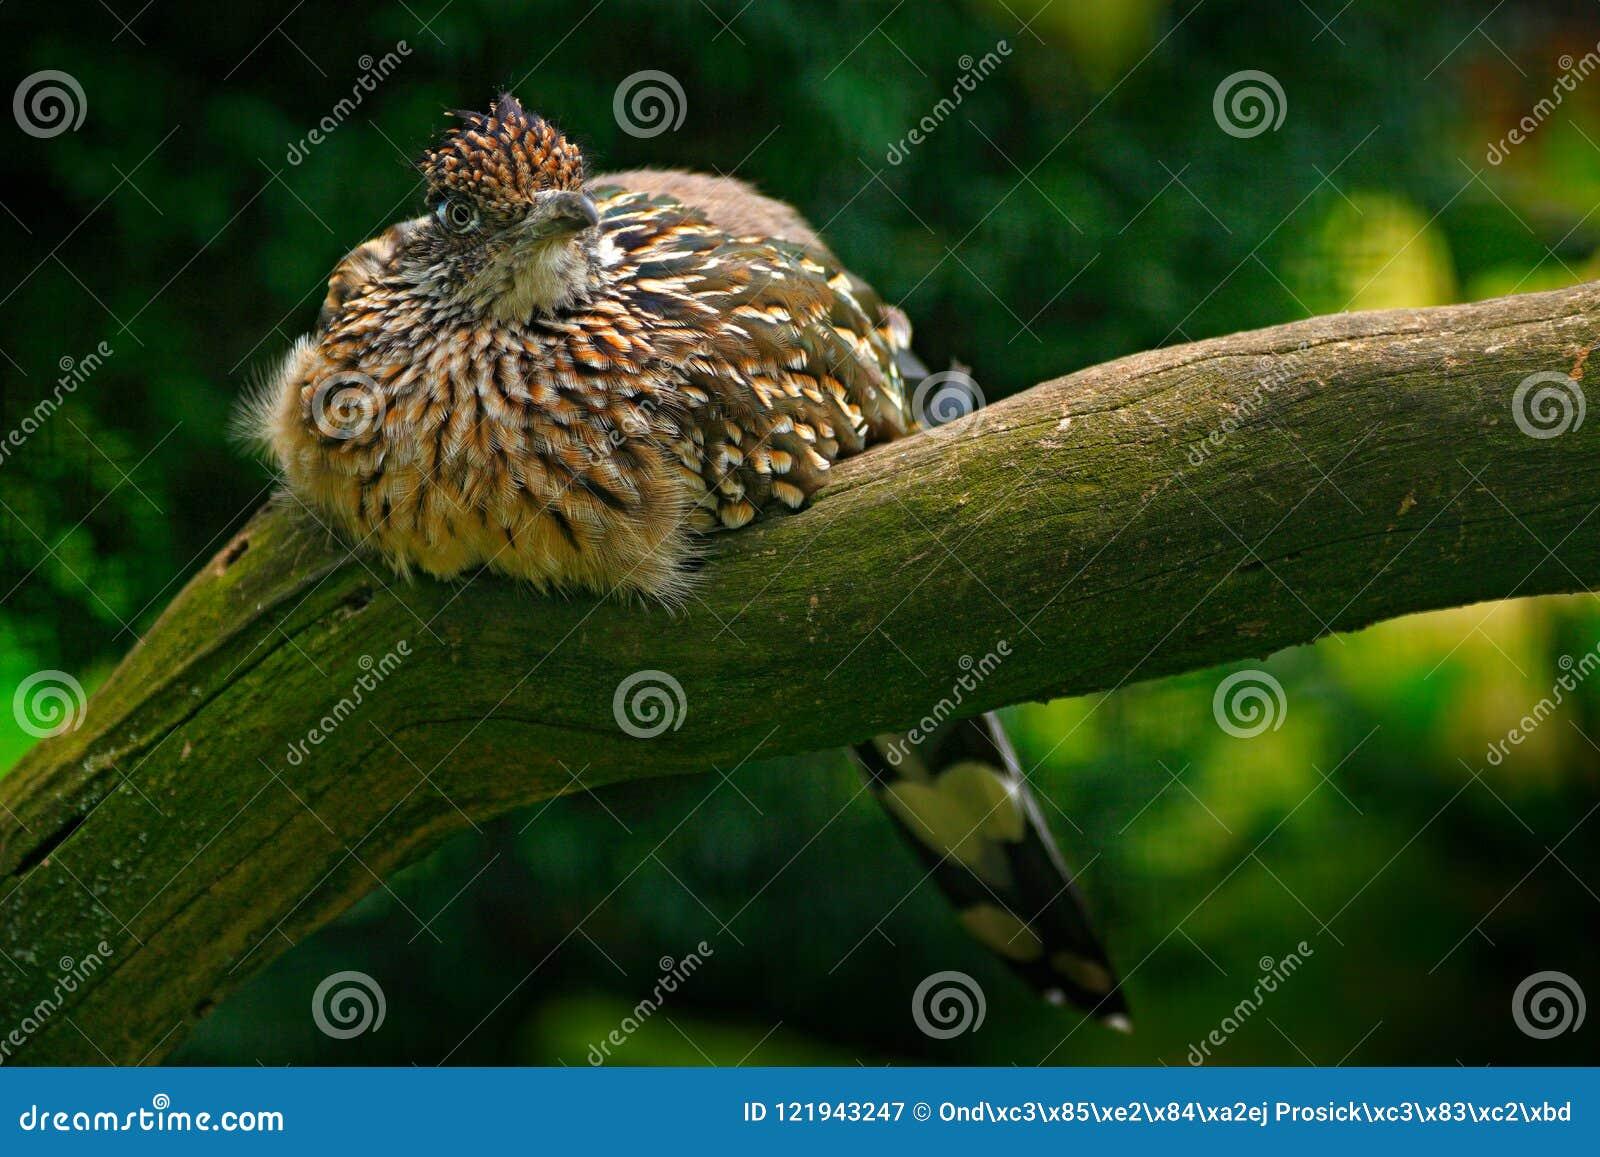 Greater roadrunner, Geococcyx californianus, bird sitting on the branch, Mexiko. Cuckoo in the nature habitat. Wildlife scene from